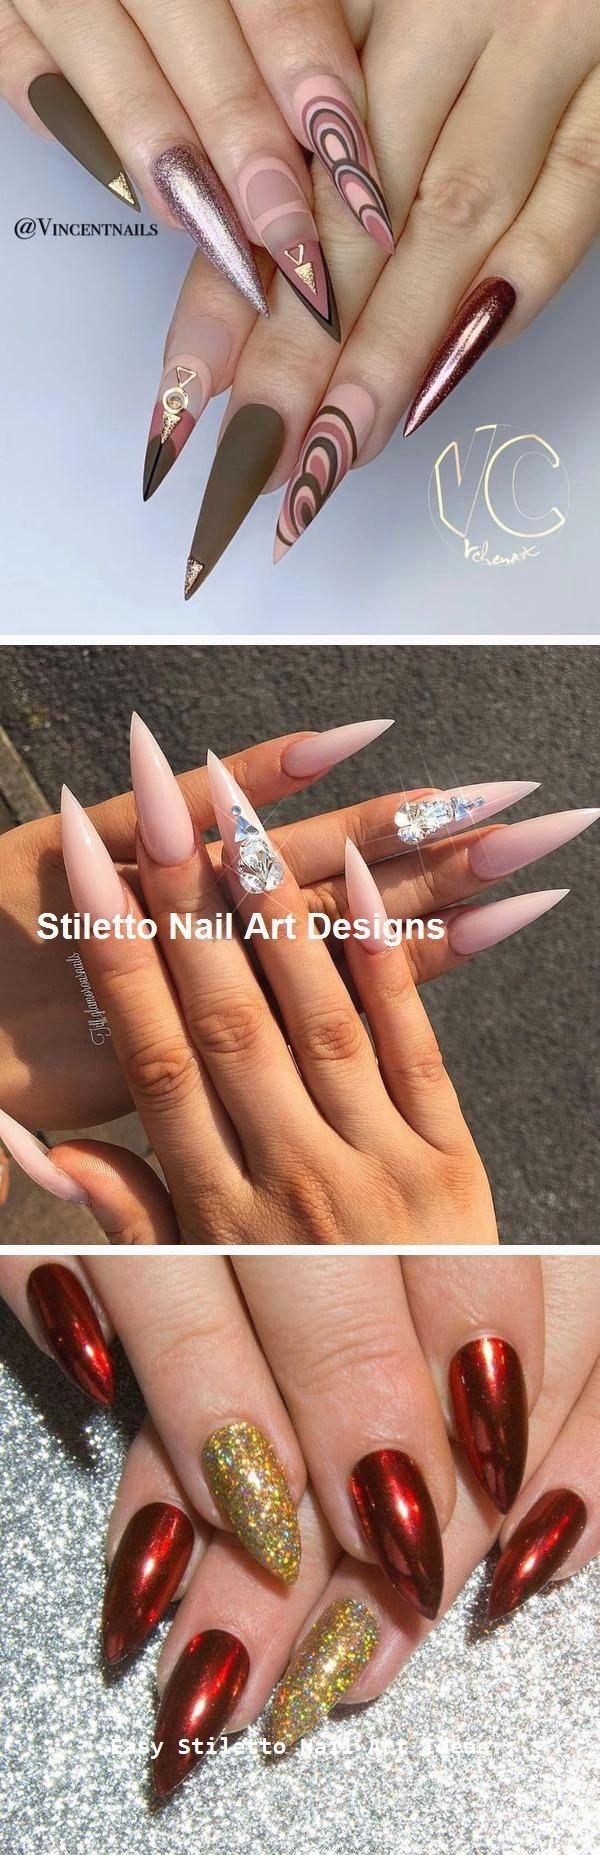 30 große Stiletto Nail Art Design-Ideen #nailideas – Nageldesign